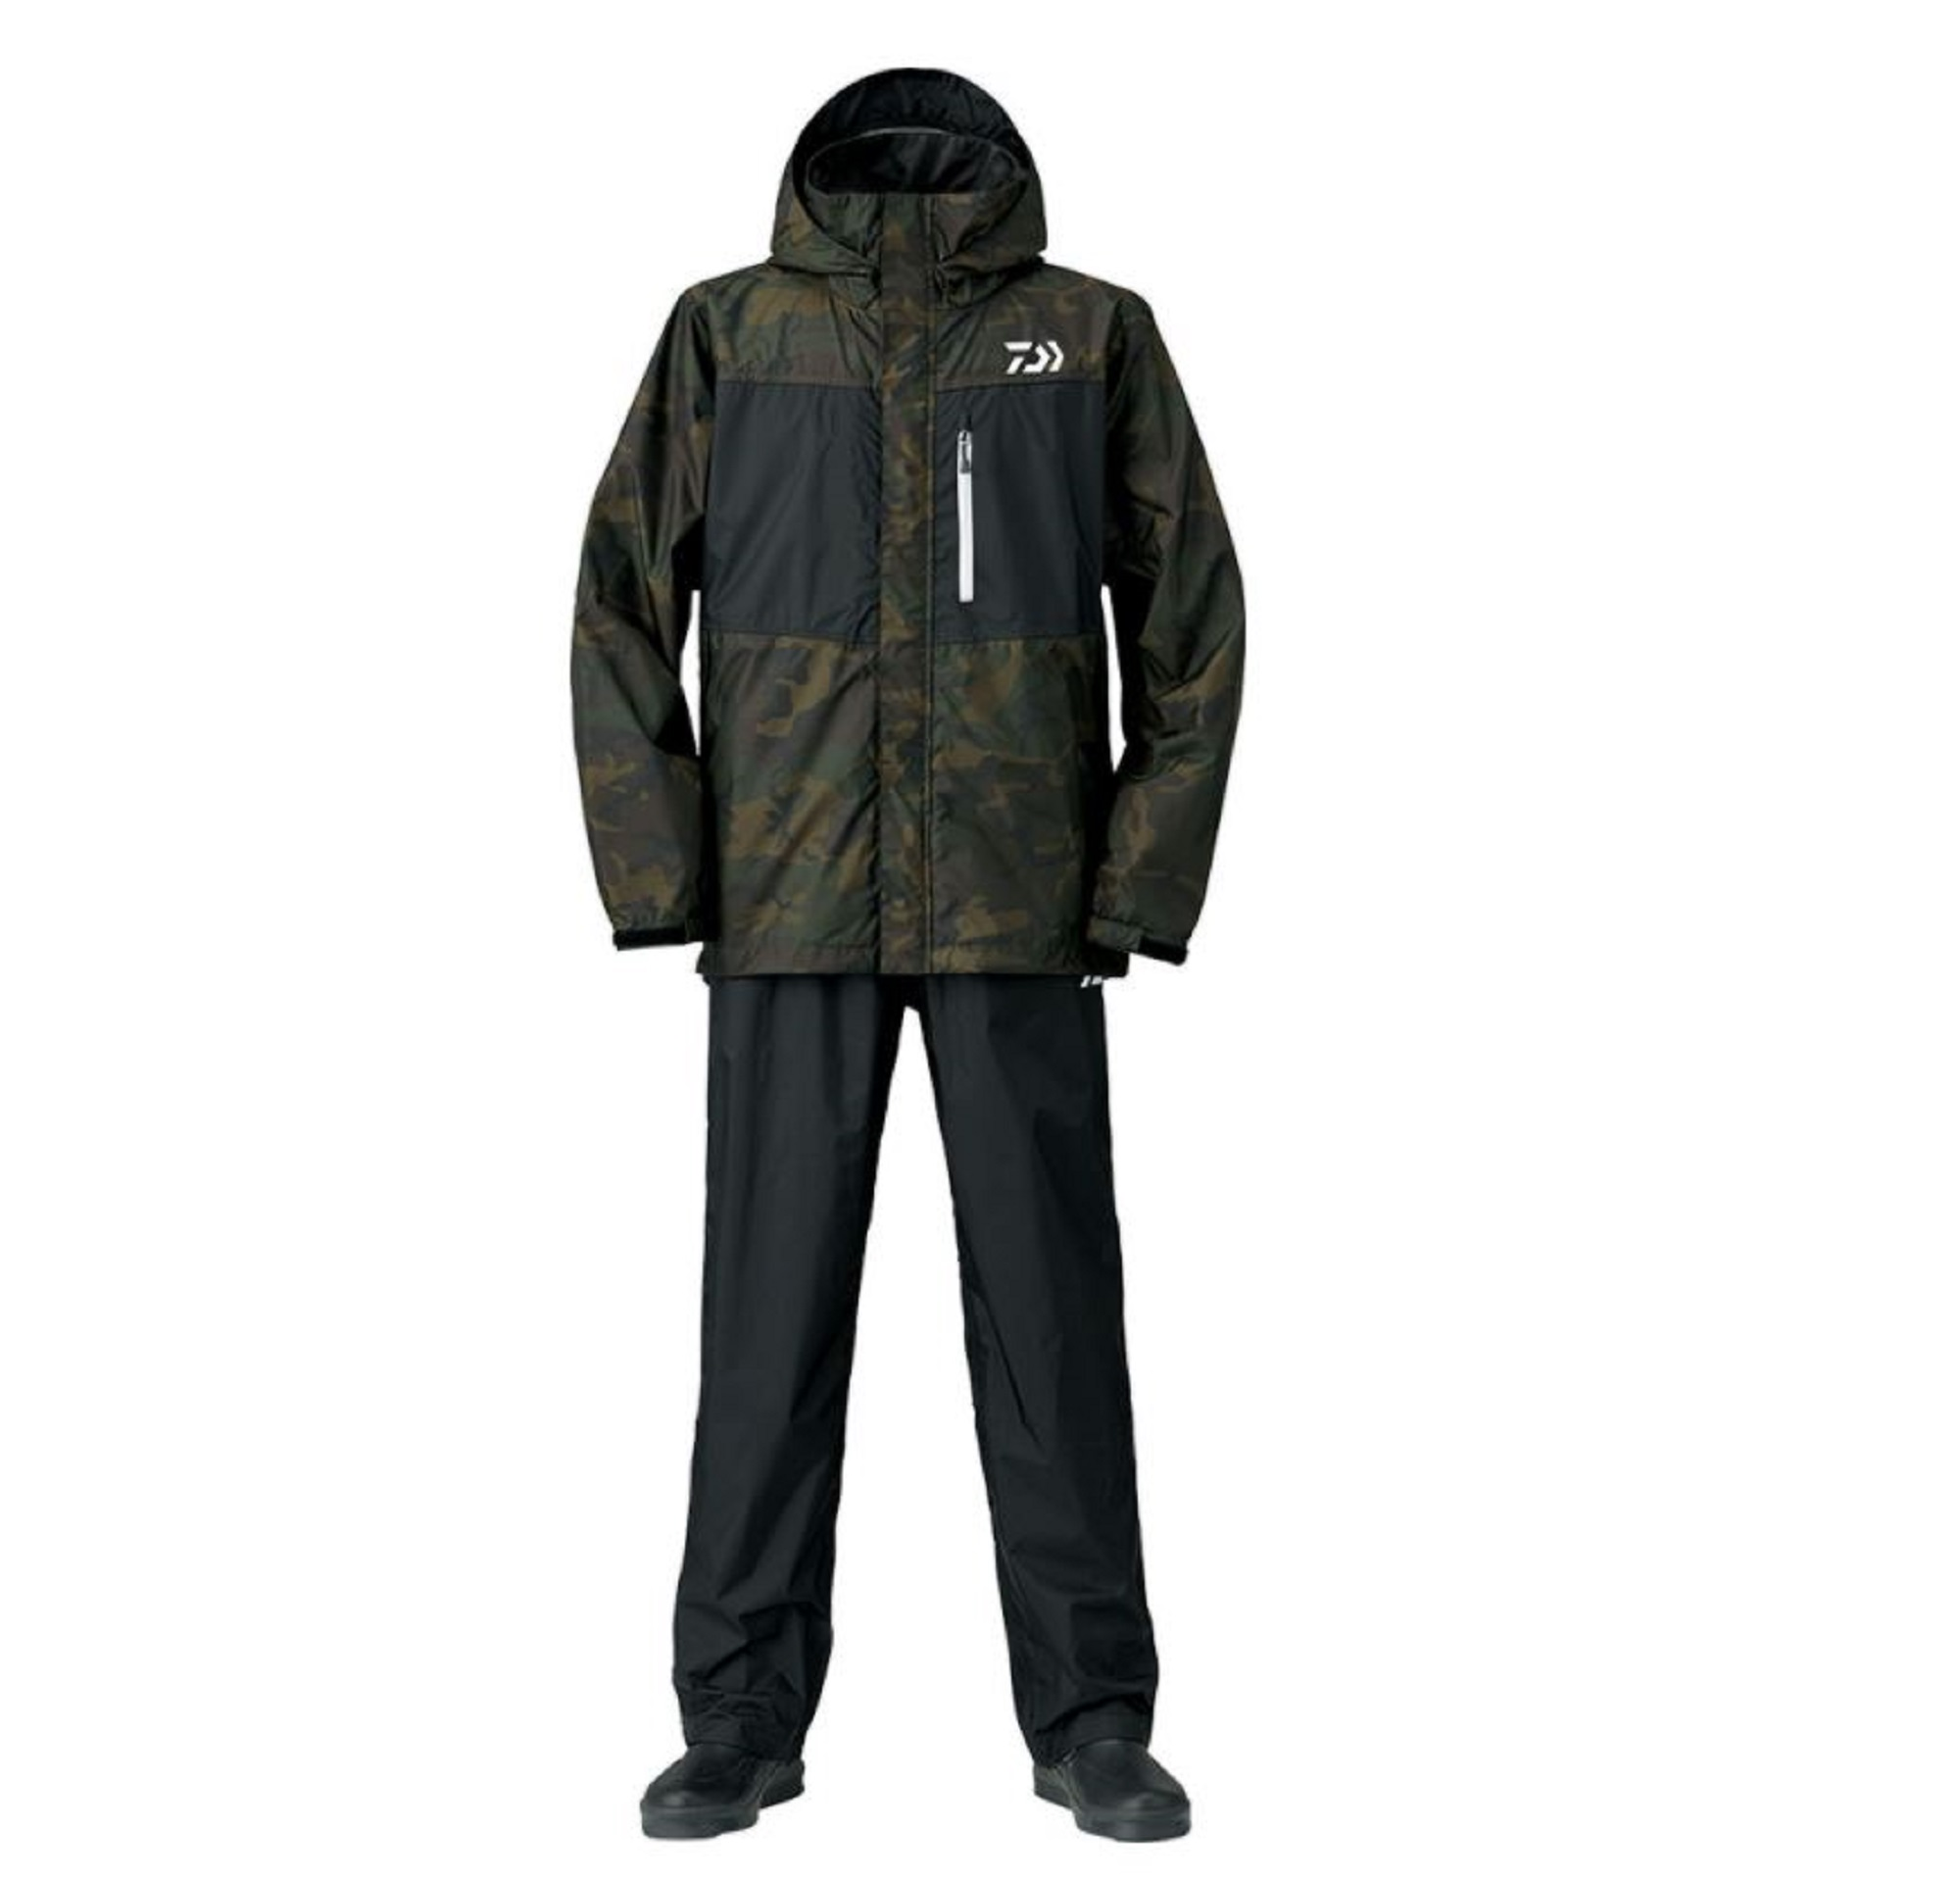 Daiwa DR-3621 Rainmax Water Repellent Jacket Size XL Green Camo (6237)